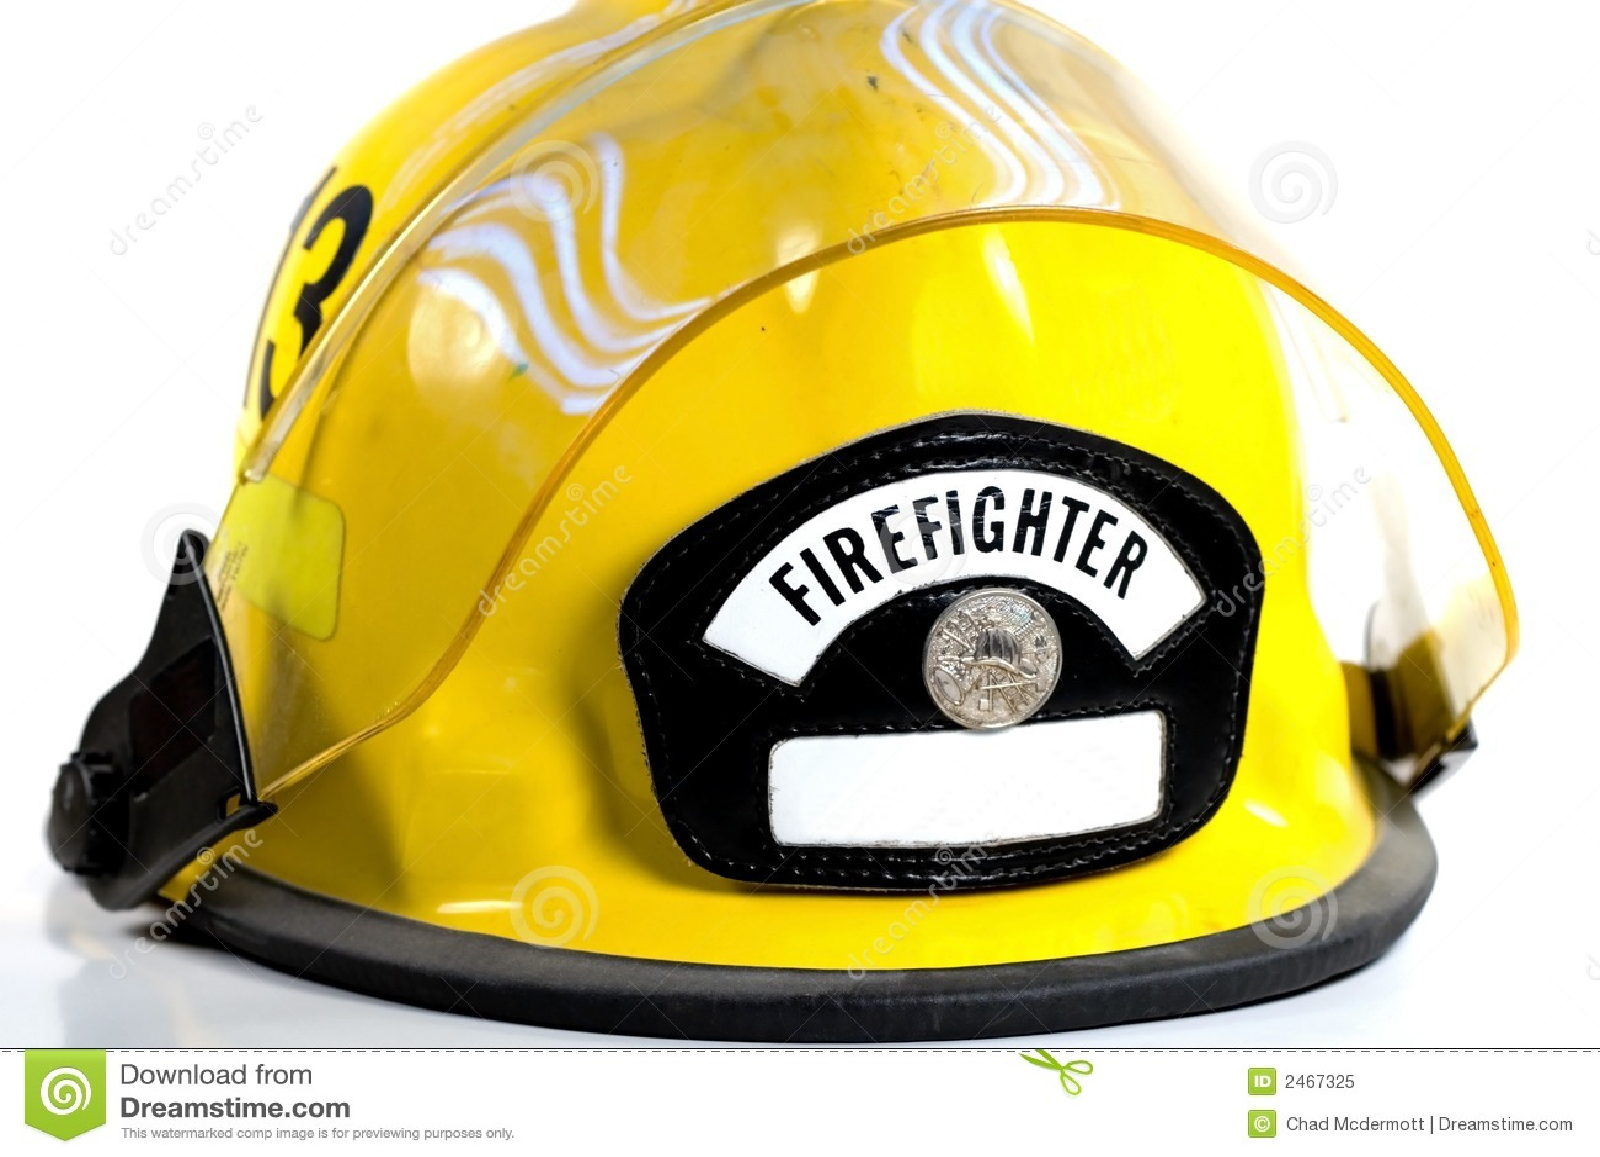 Fireman Helmet Clip Art Fireman s helmet